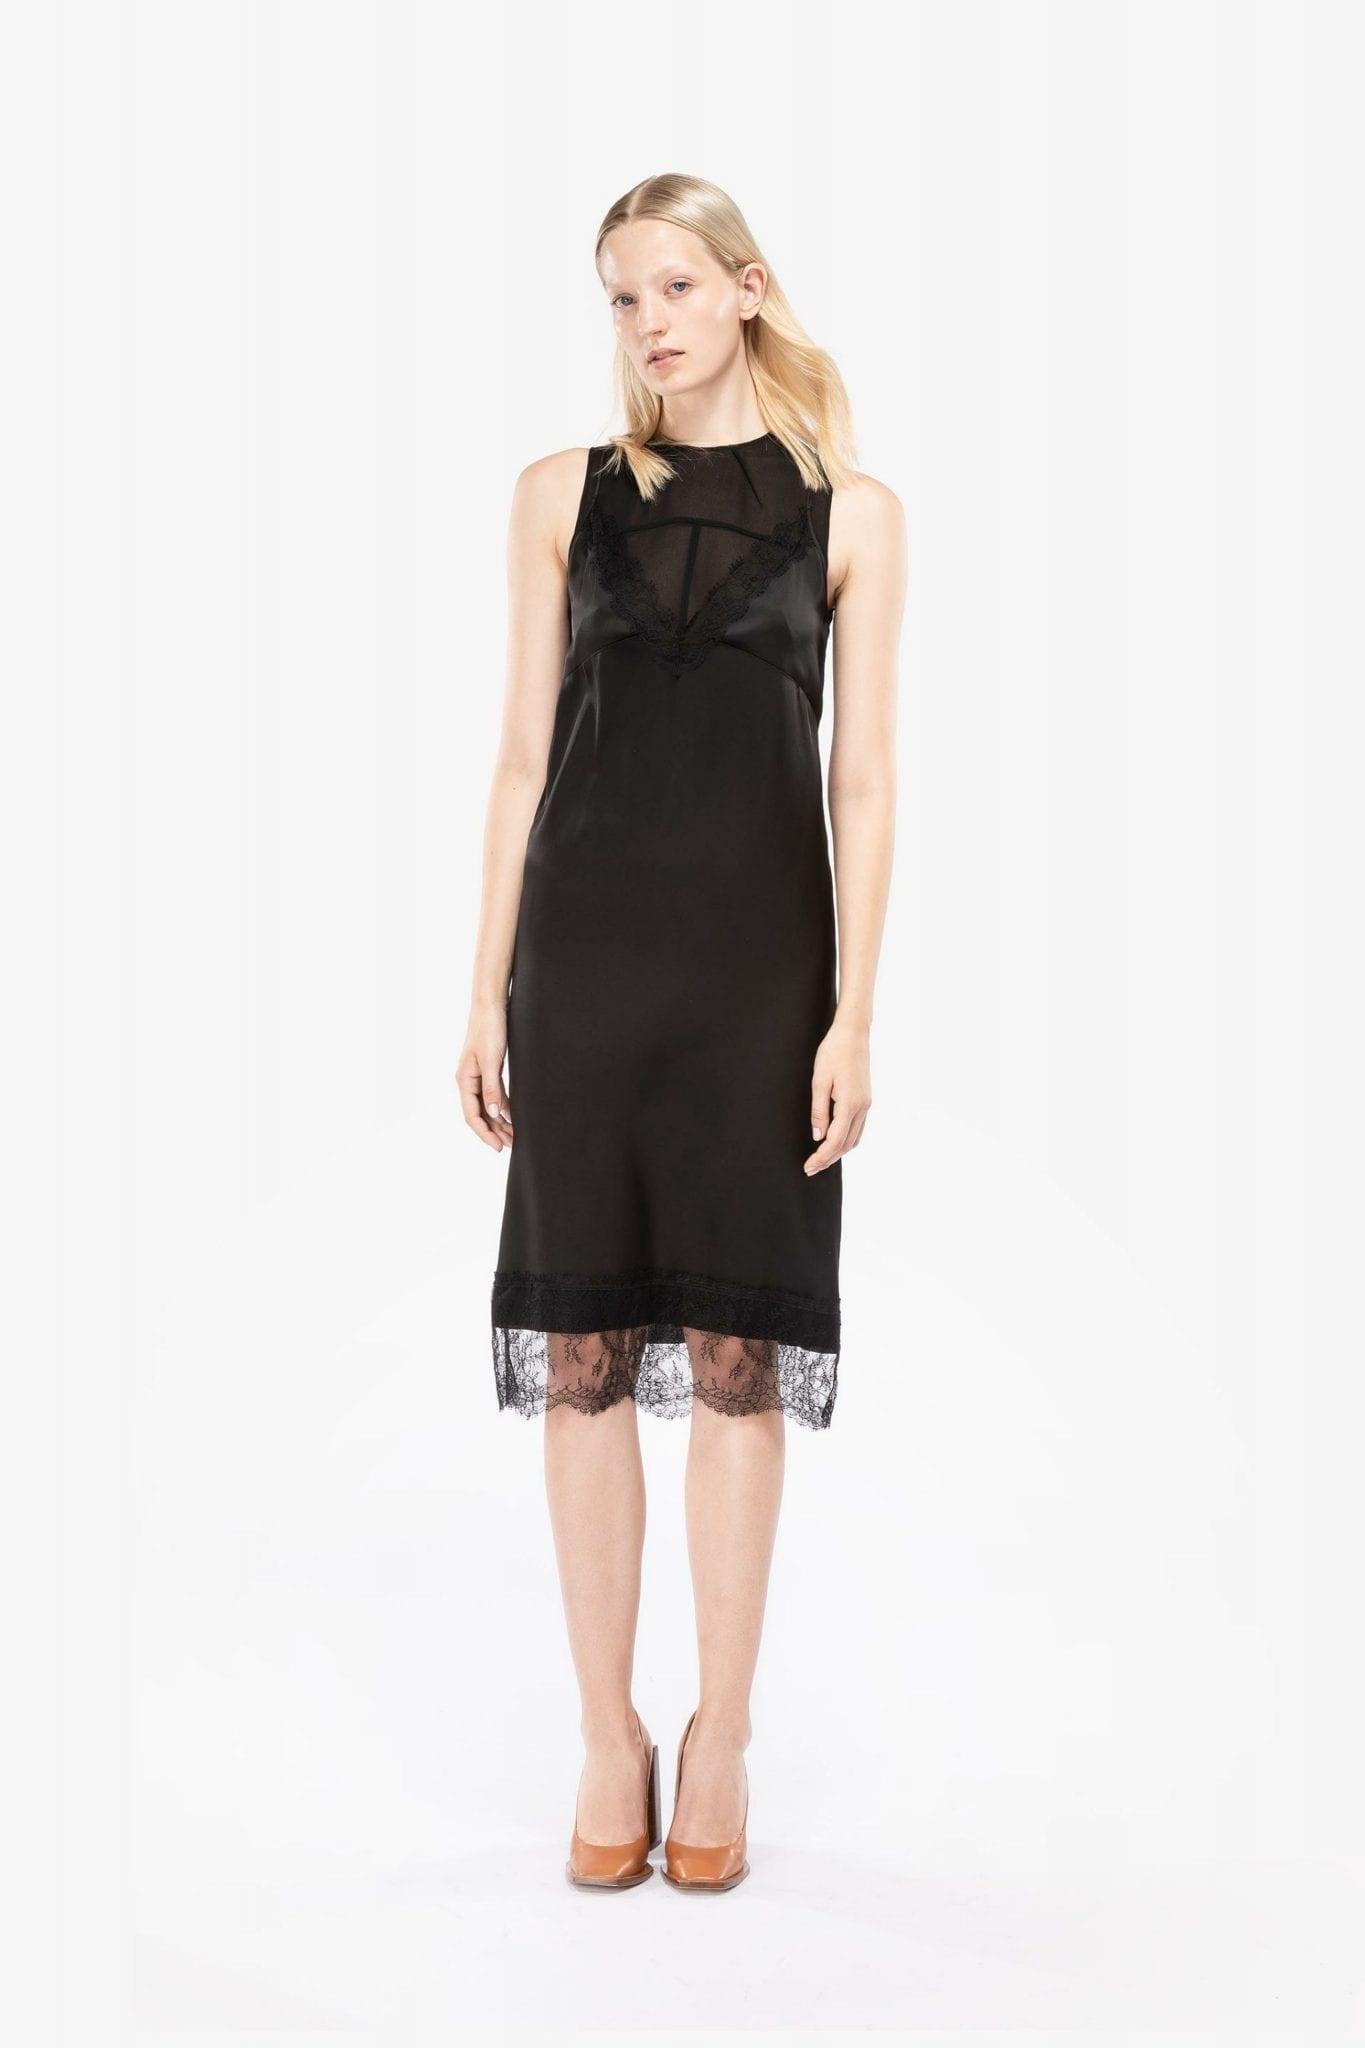 N20 Sheer Panel Dress